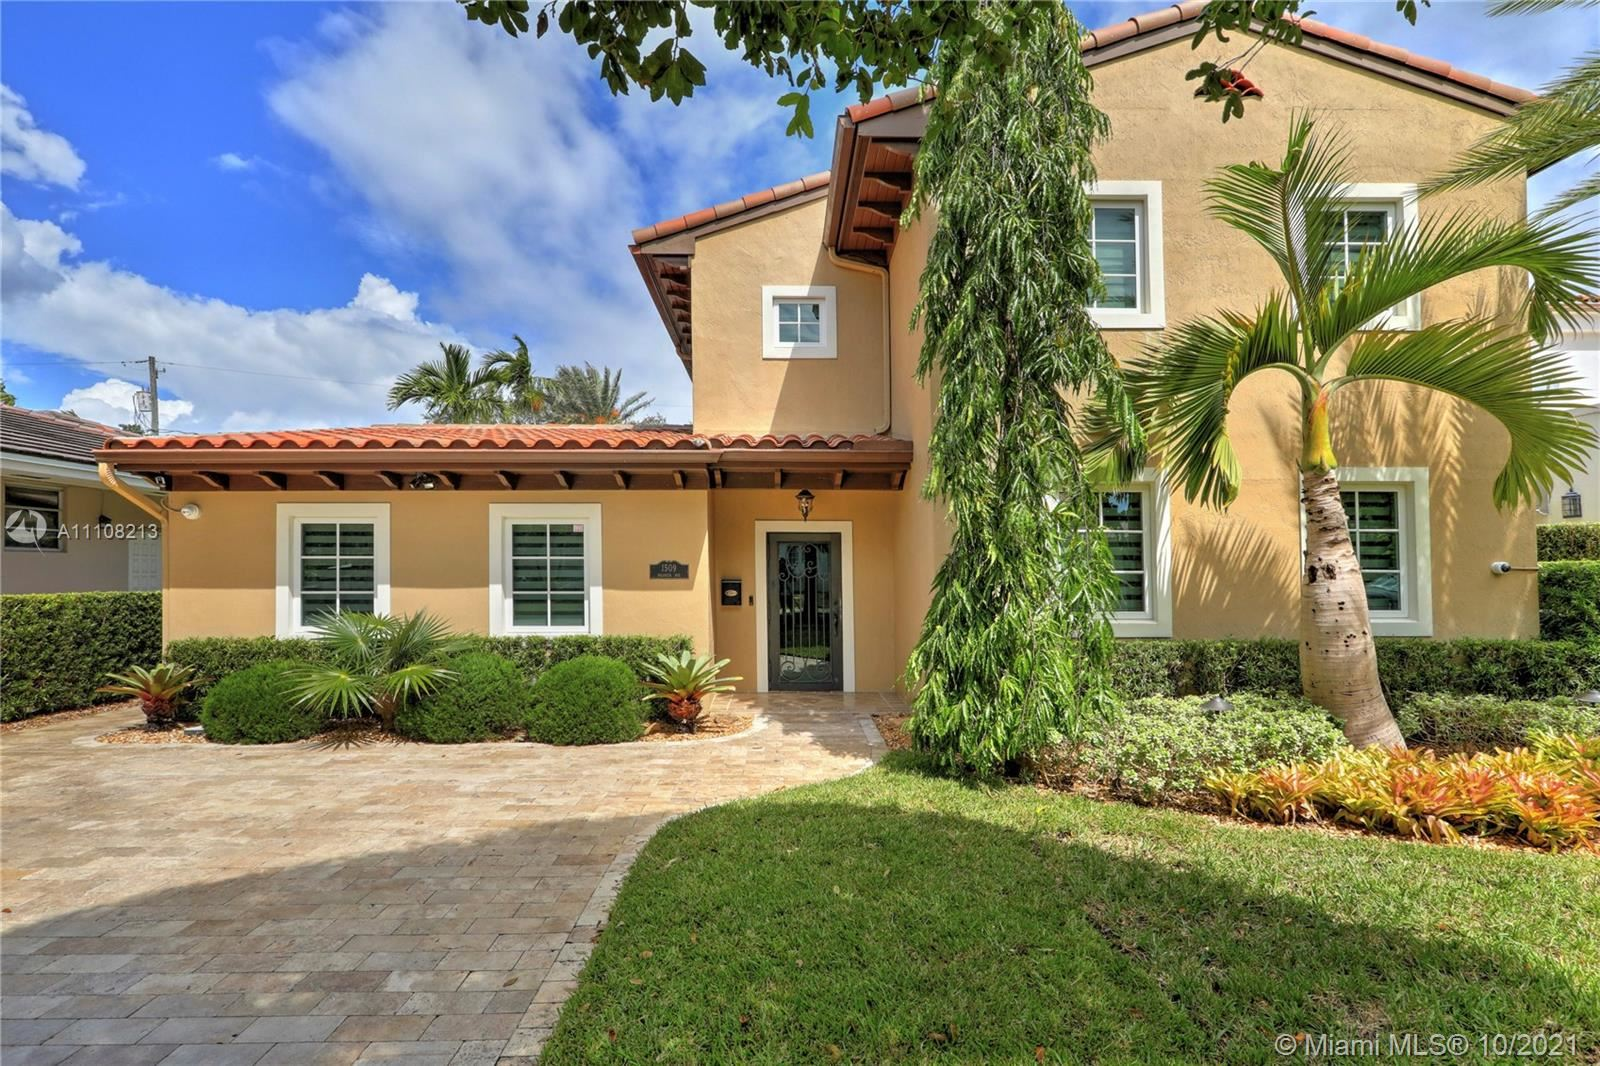 Photo of 1509 Palancia Ave, Coral Gables, FL 33146 (MLS # A11108213)